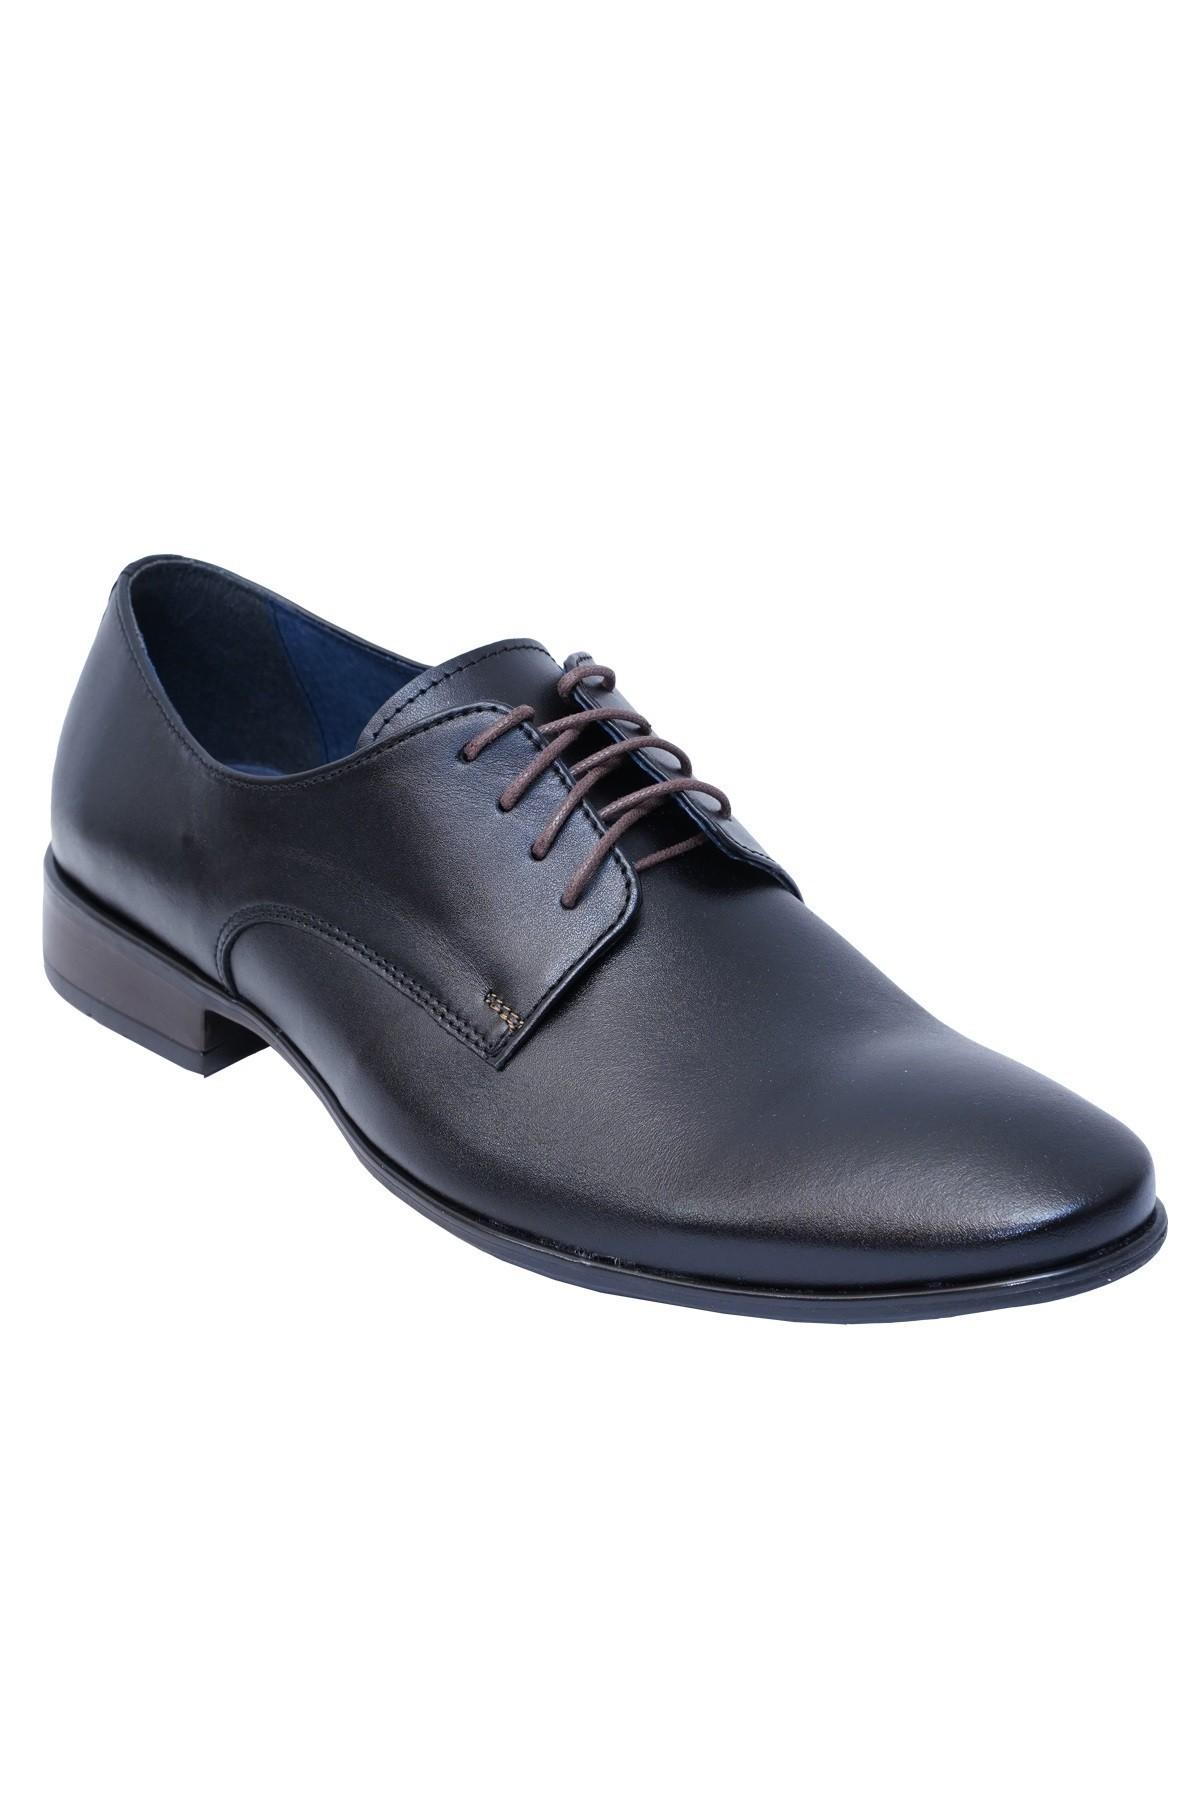 czarne  buty eleganckie do garnituru